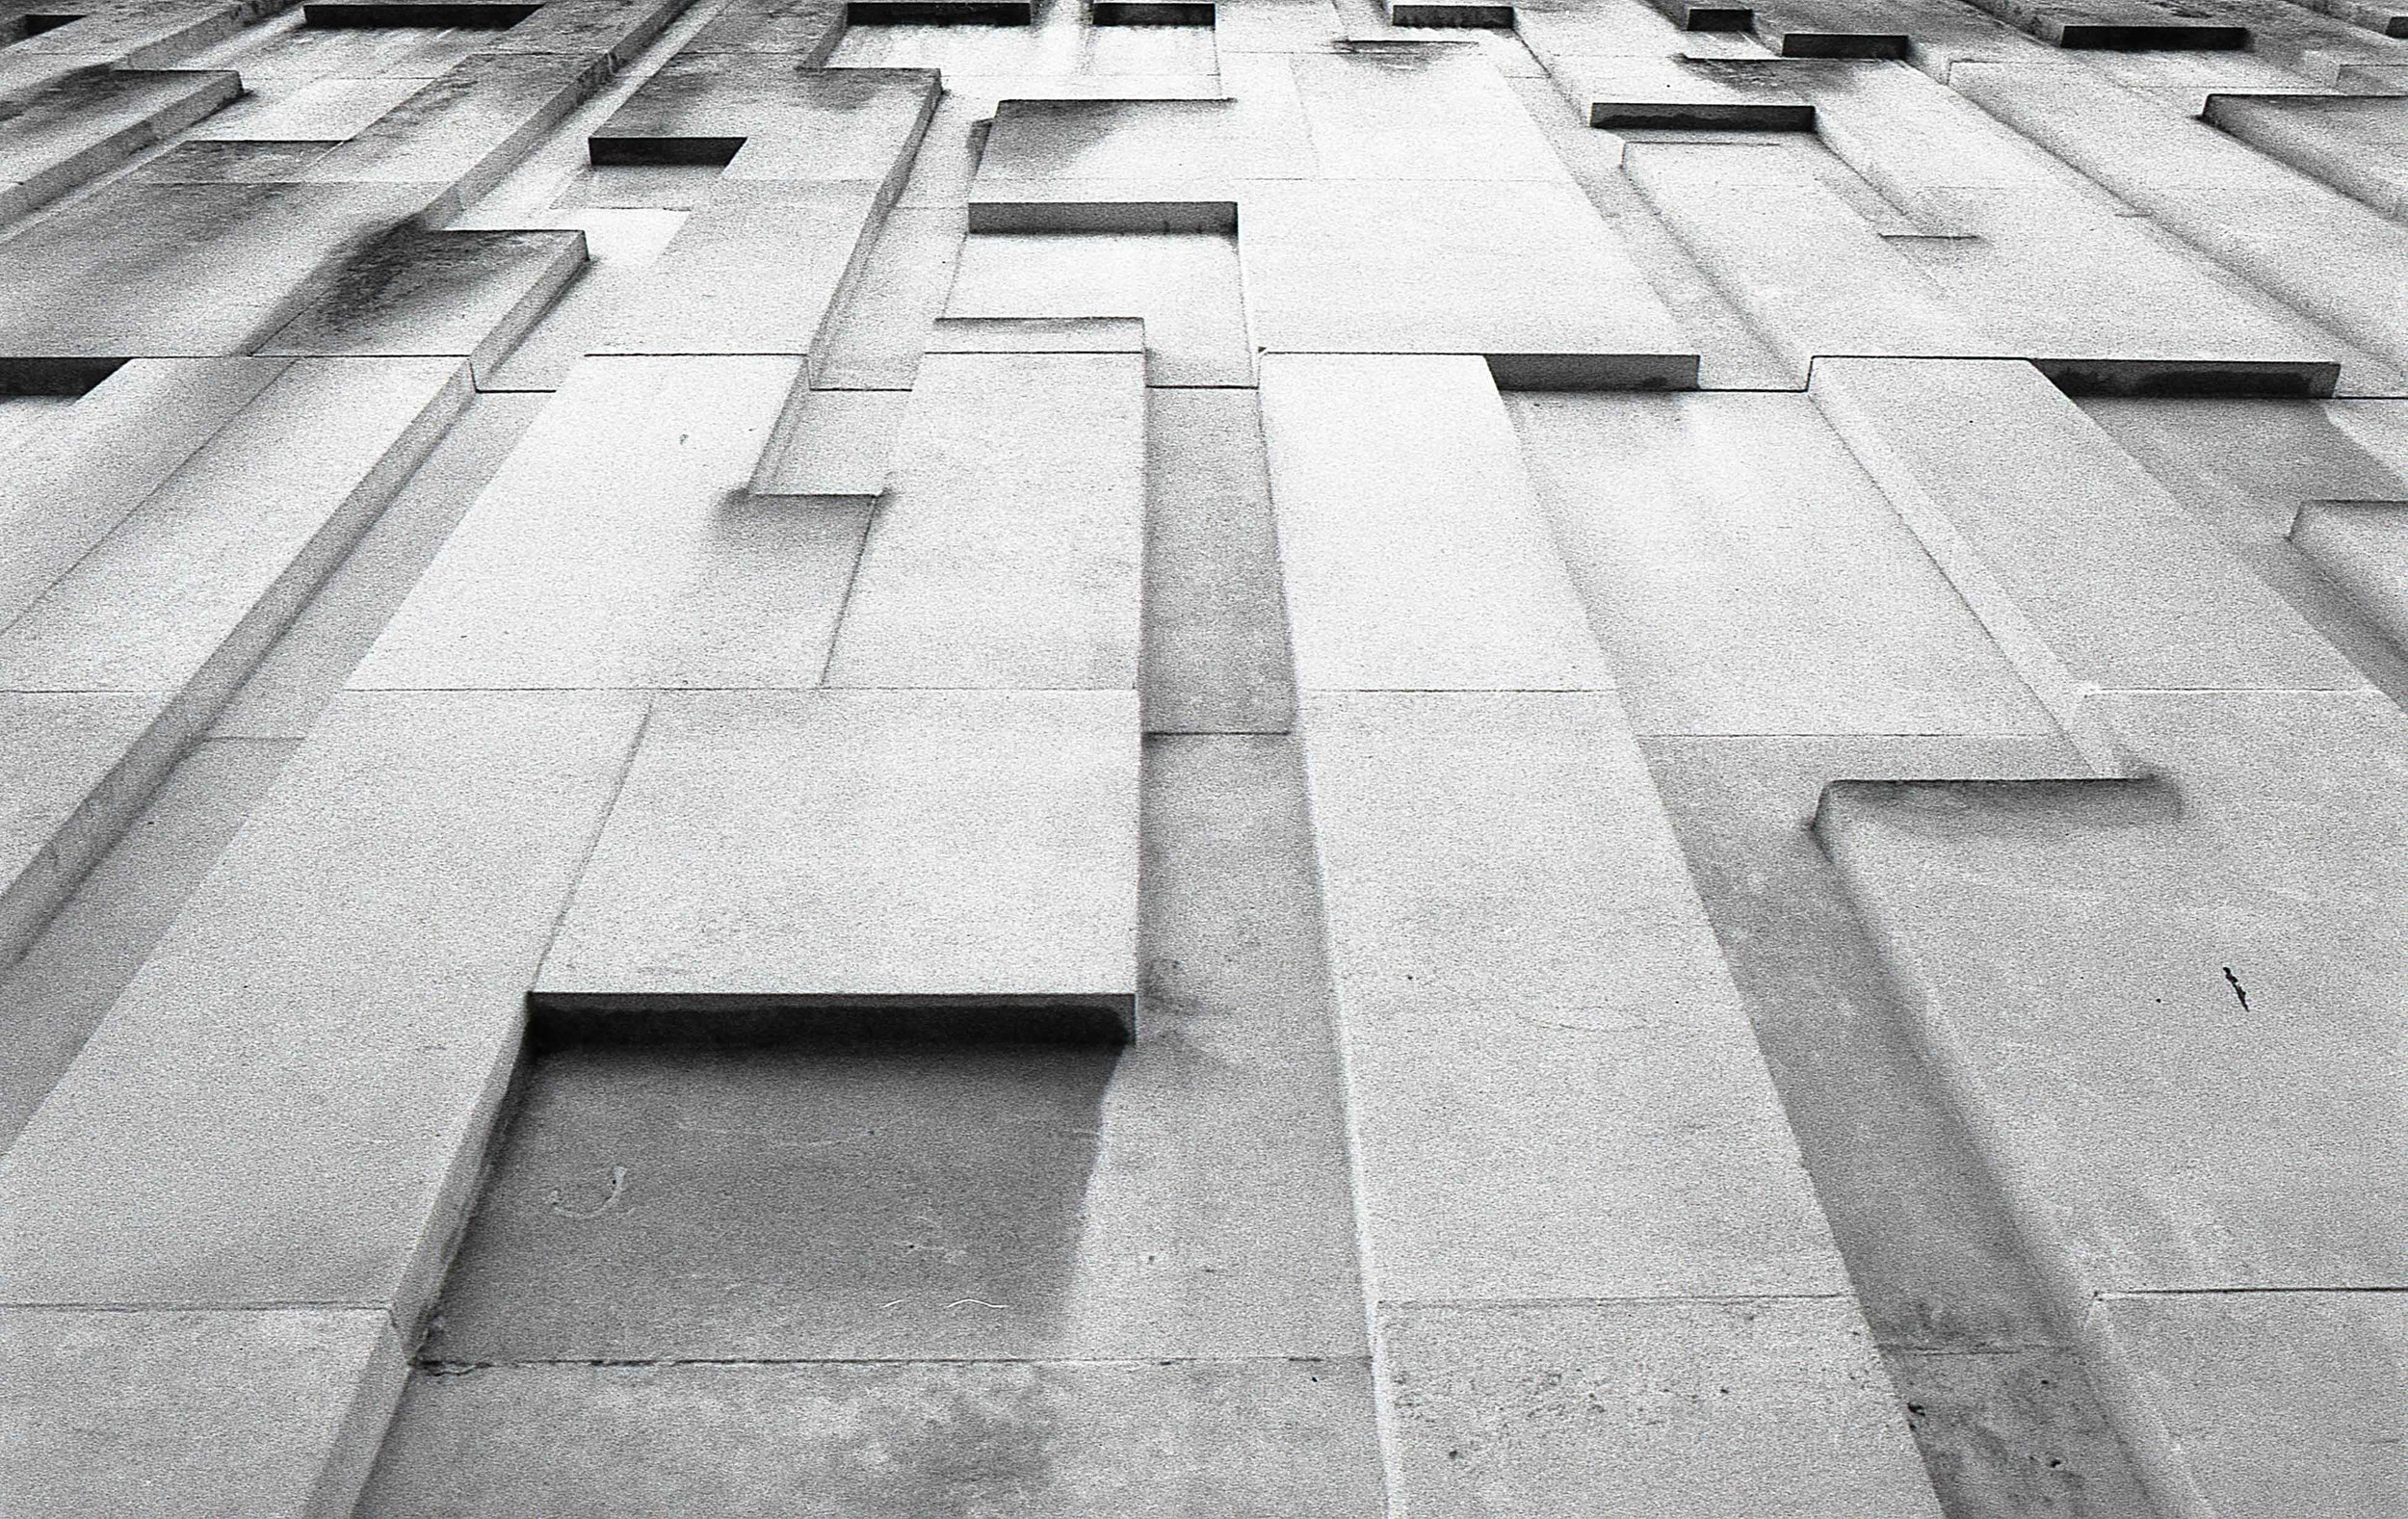 Bradford City Centre does a good line in modernist concrete